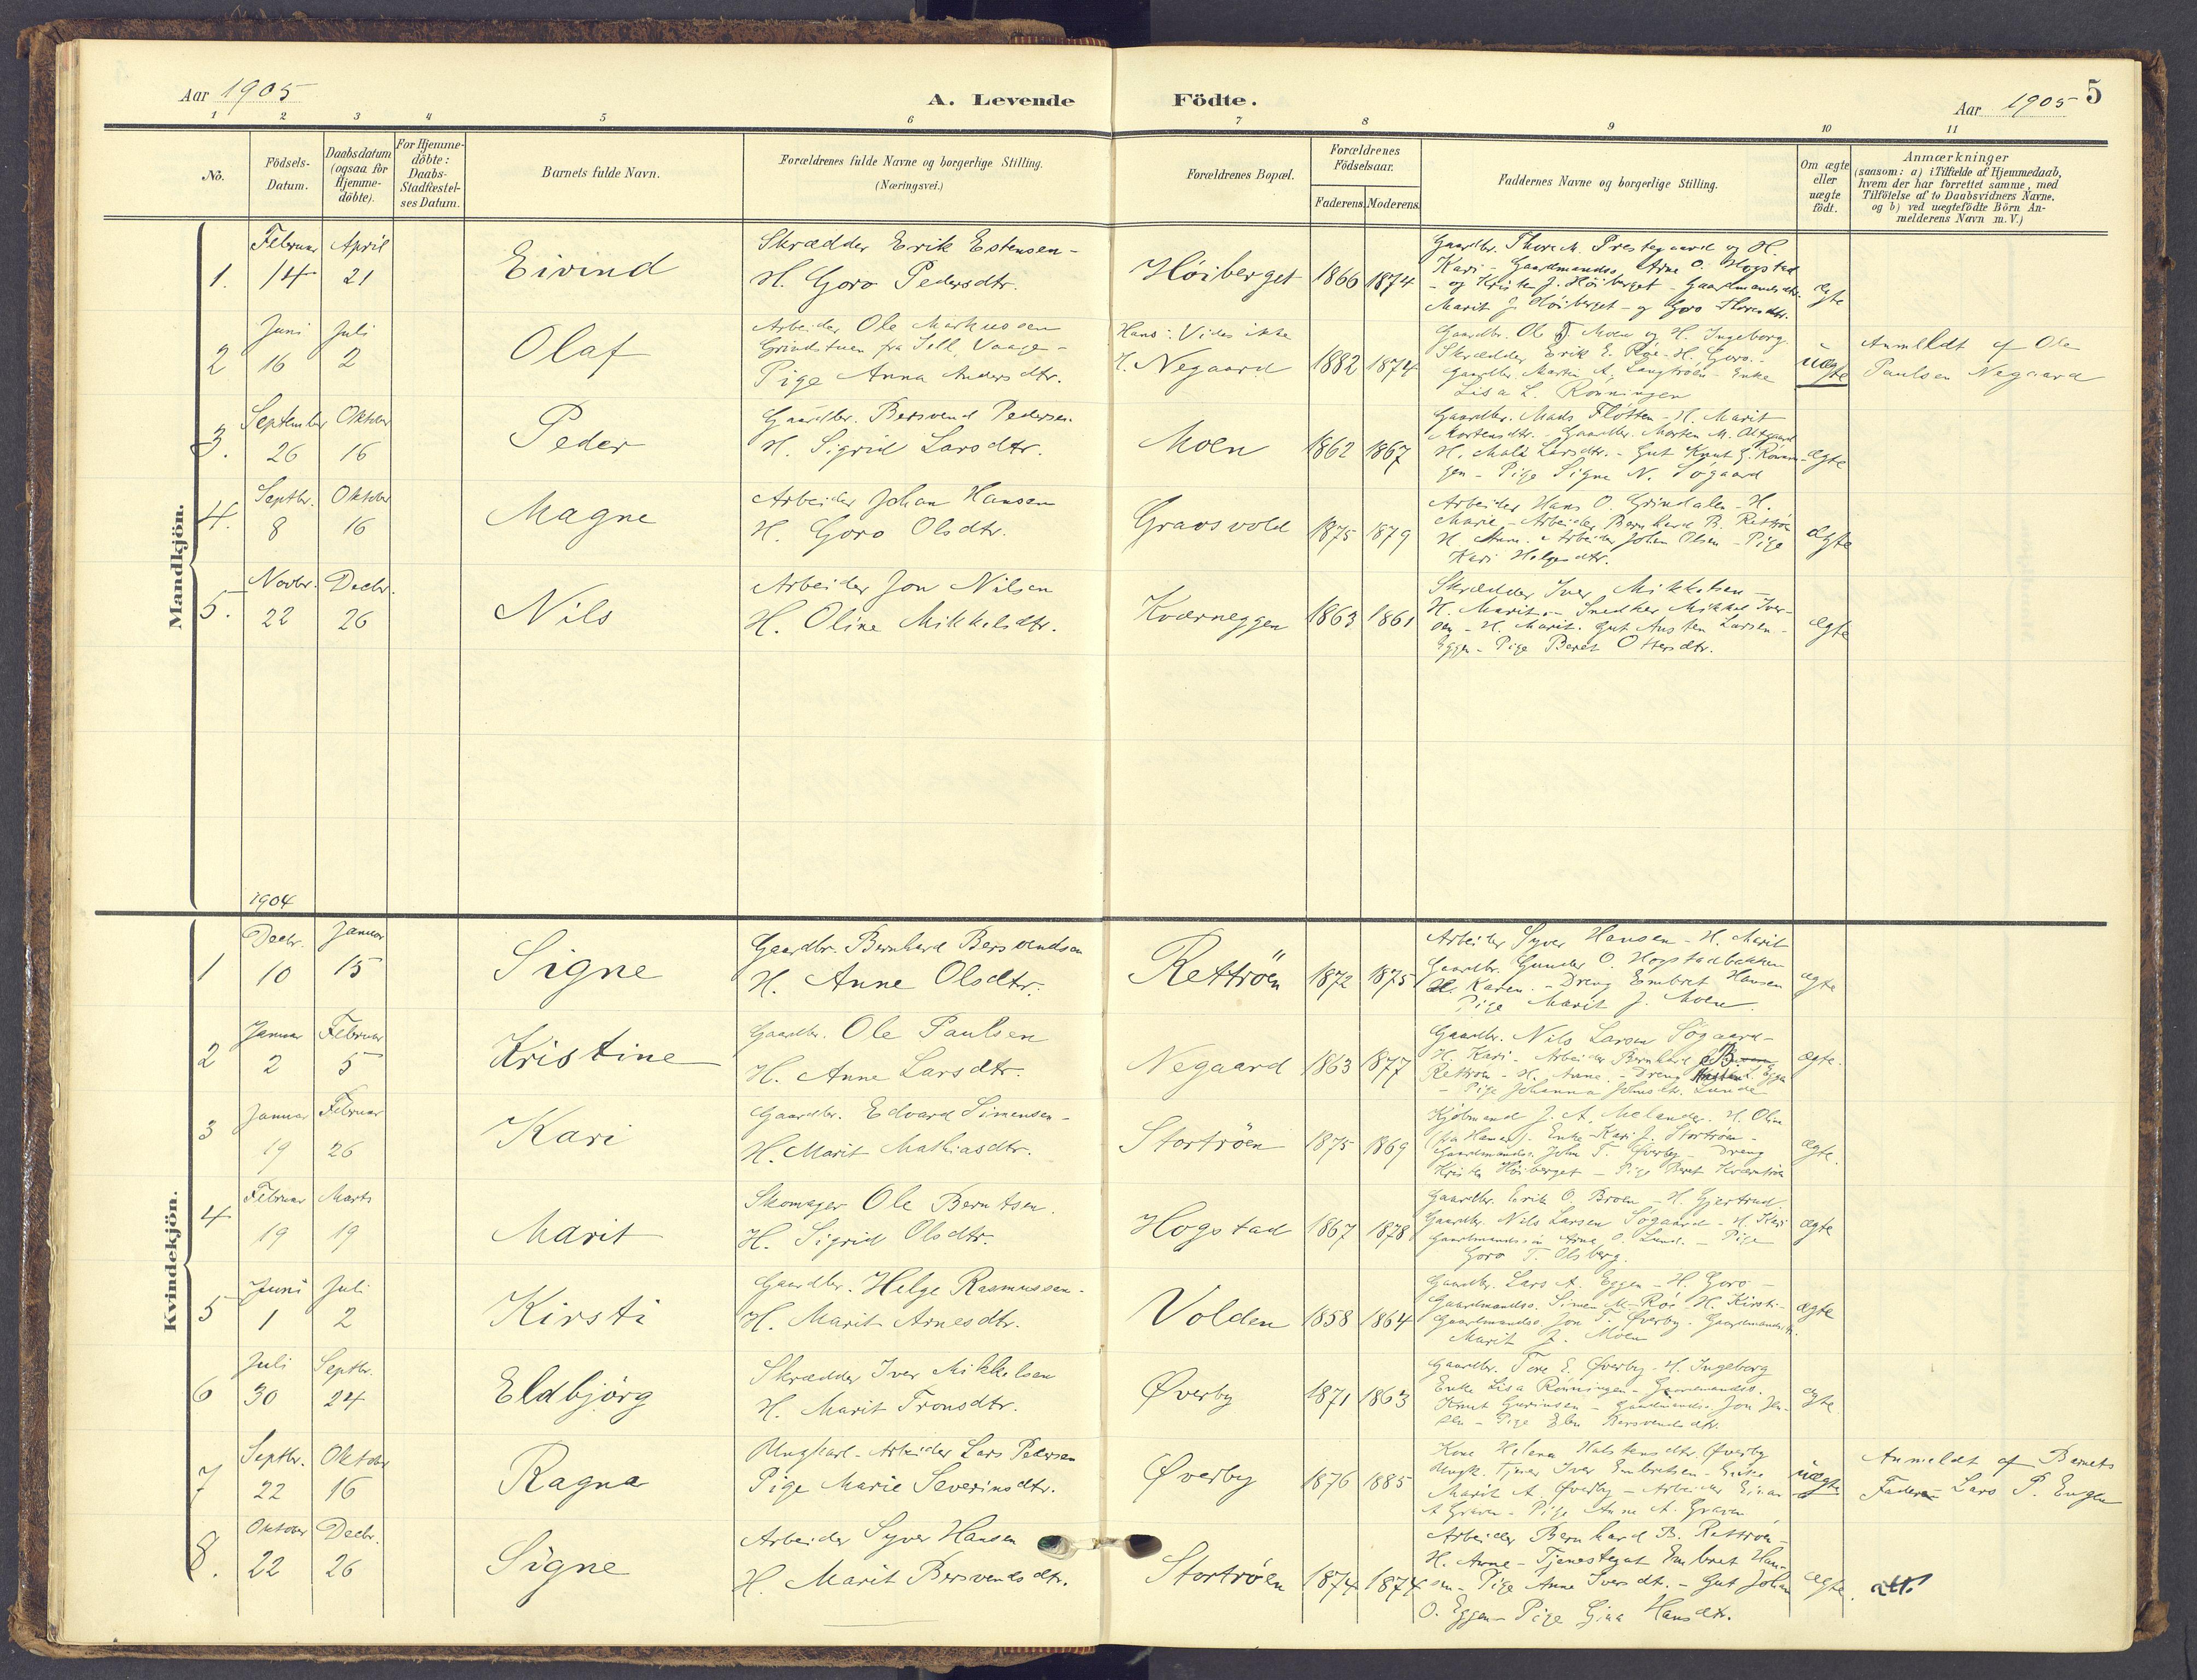 SAH, Tynset prestekontor, Ministerialbok nr. 28, 1902-1929, s. 5